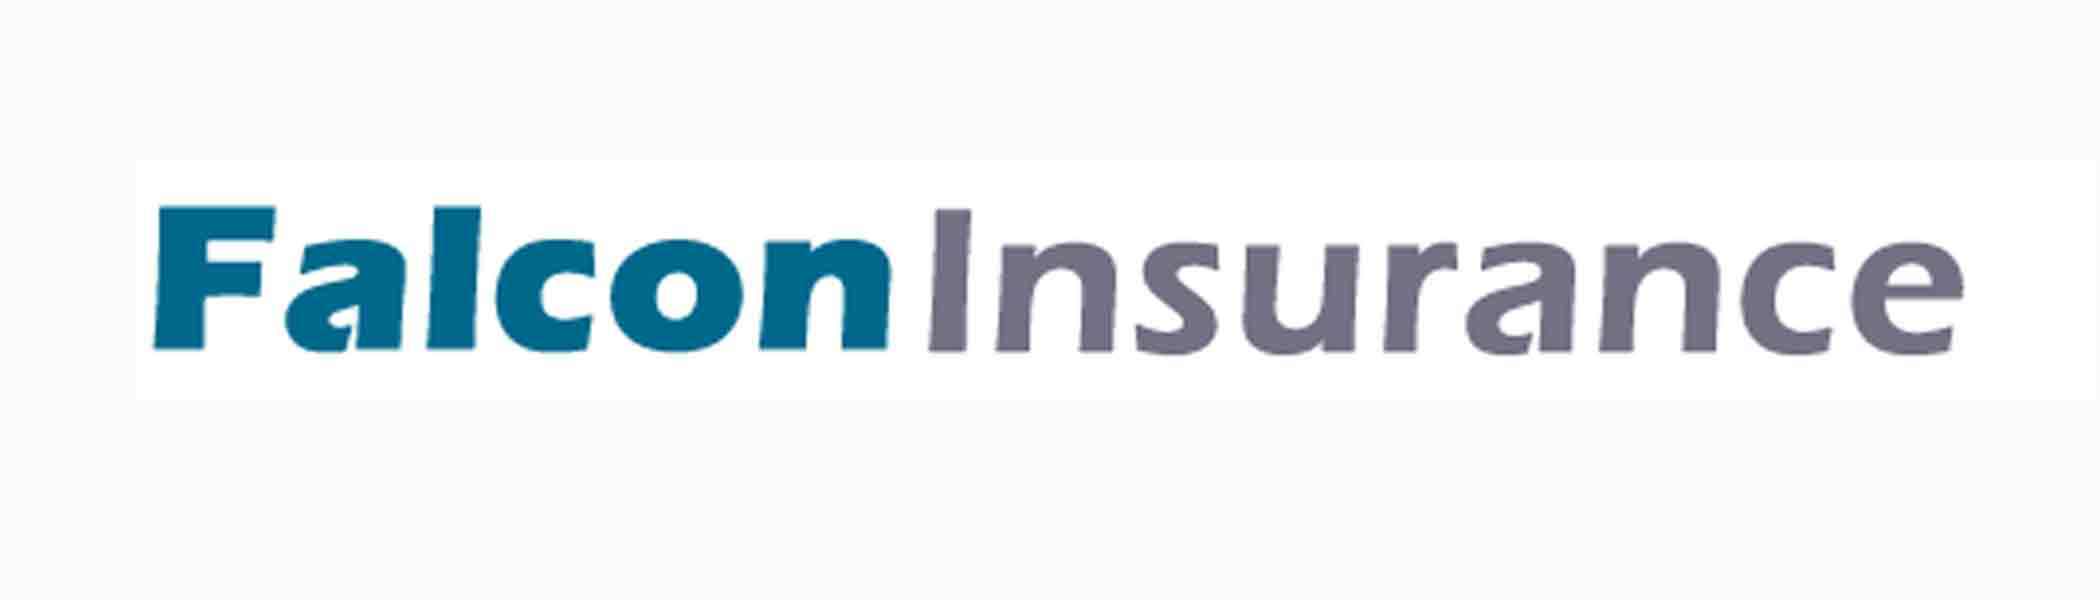 falcon-insurance, Insurance companies in Seychelles Islands